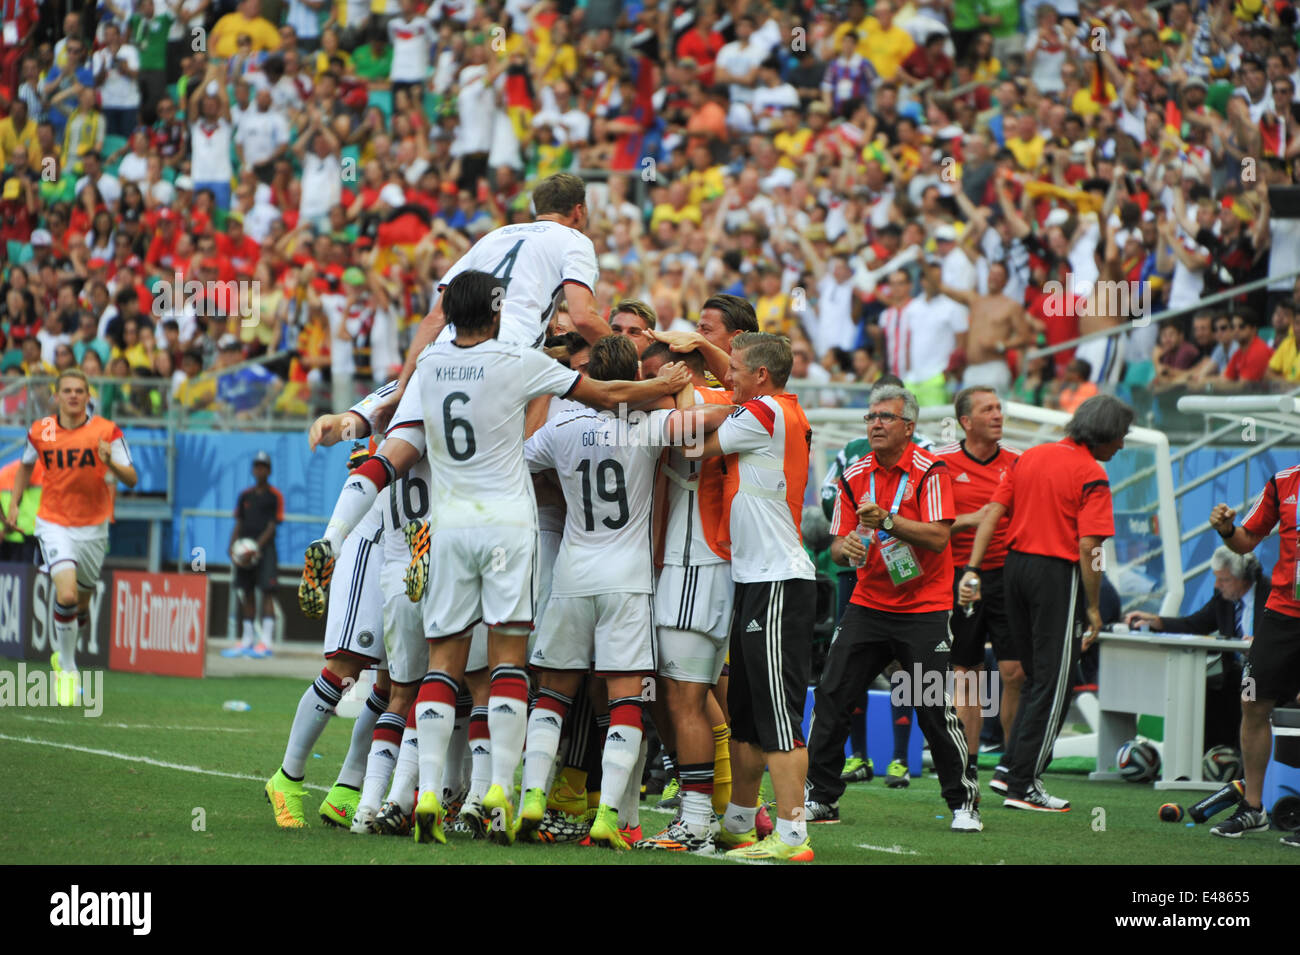 Deutsche Mannschaft im Torjubel, Deutschand vs. Portugal (4:0), WM 2014, Salvador da Bahia, Brasilien. Editorial - Stock Image